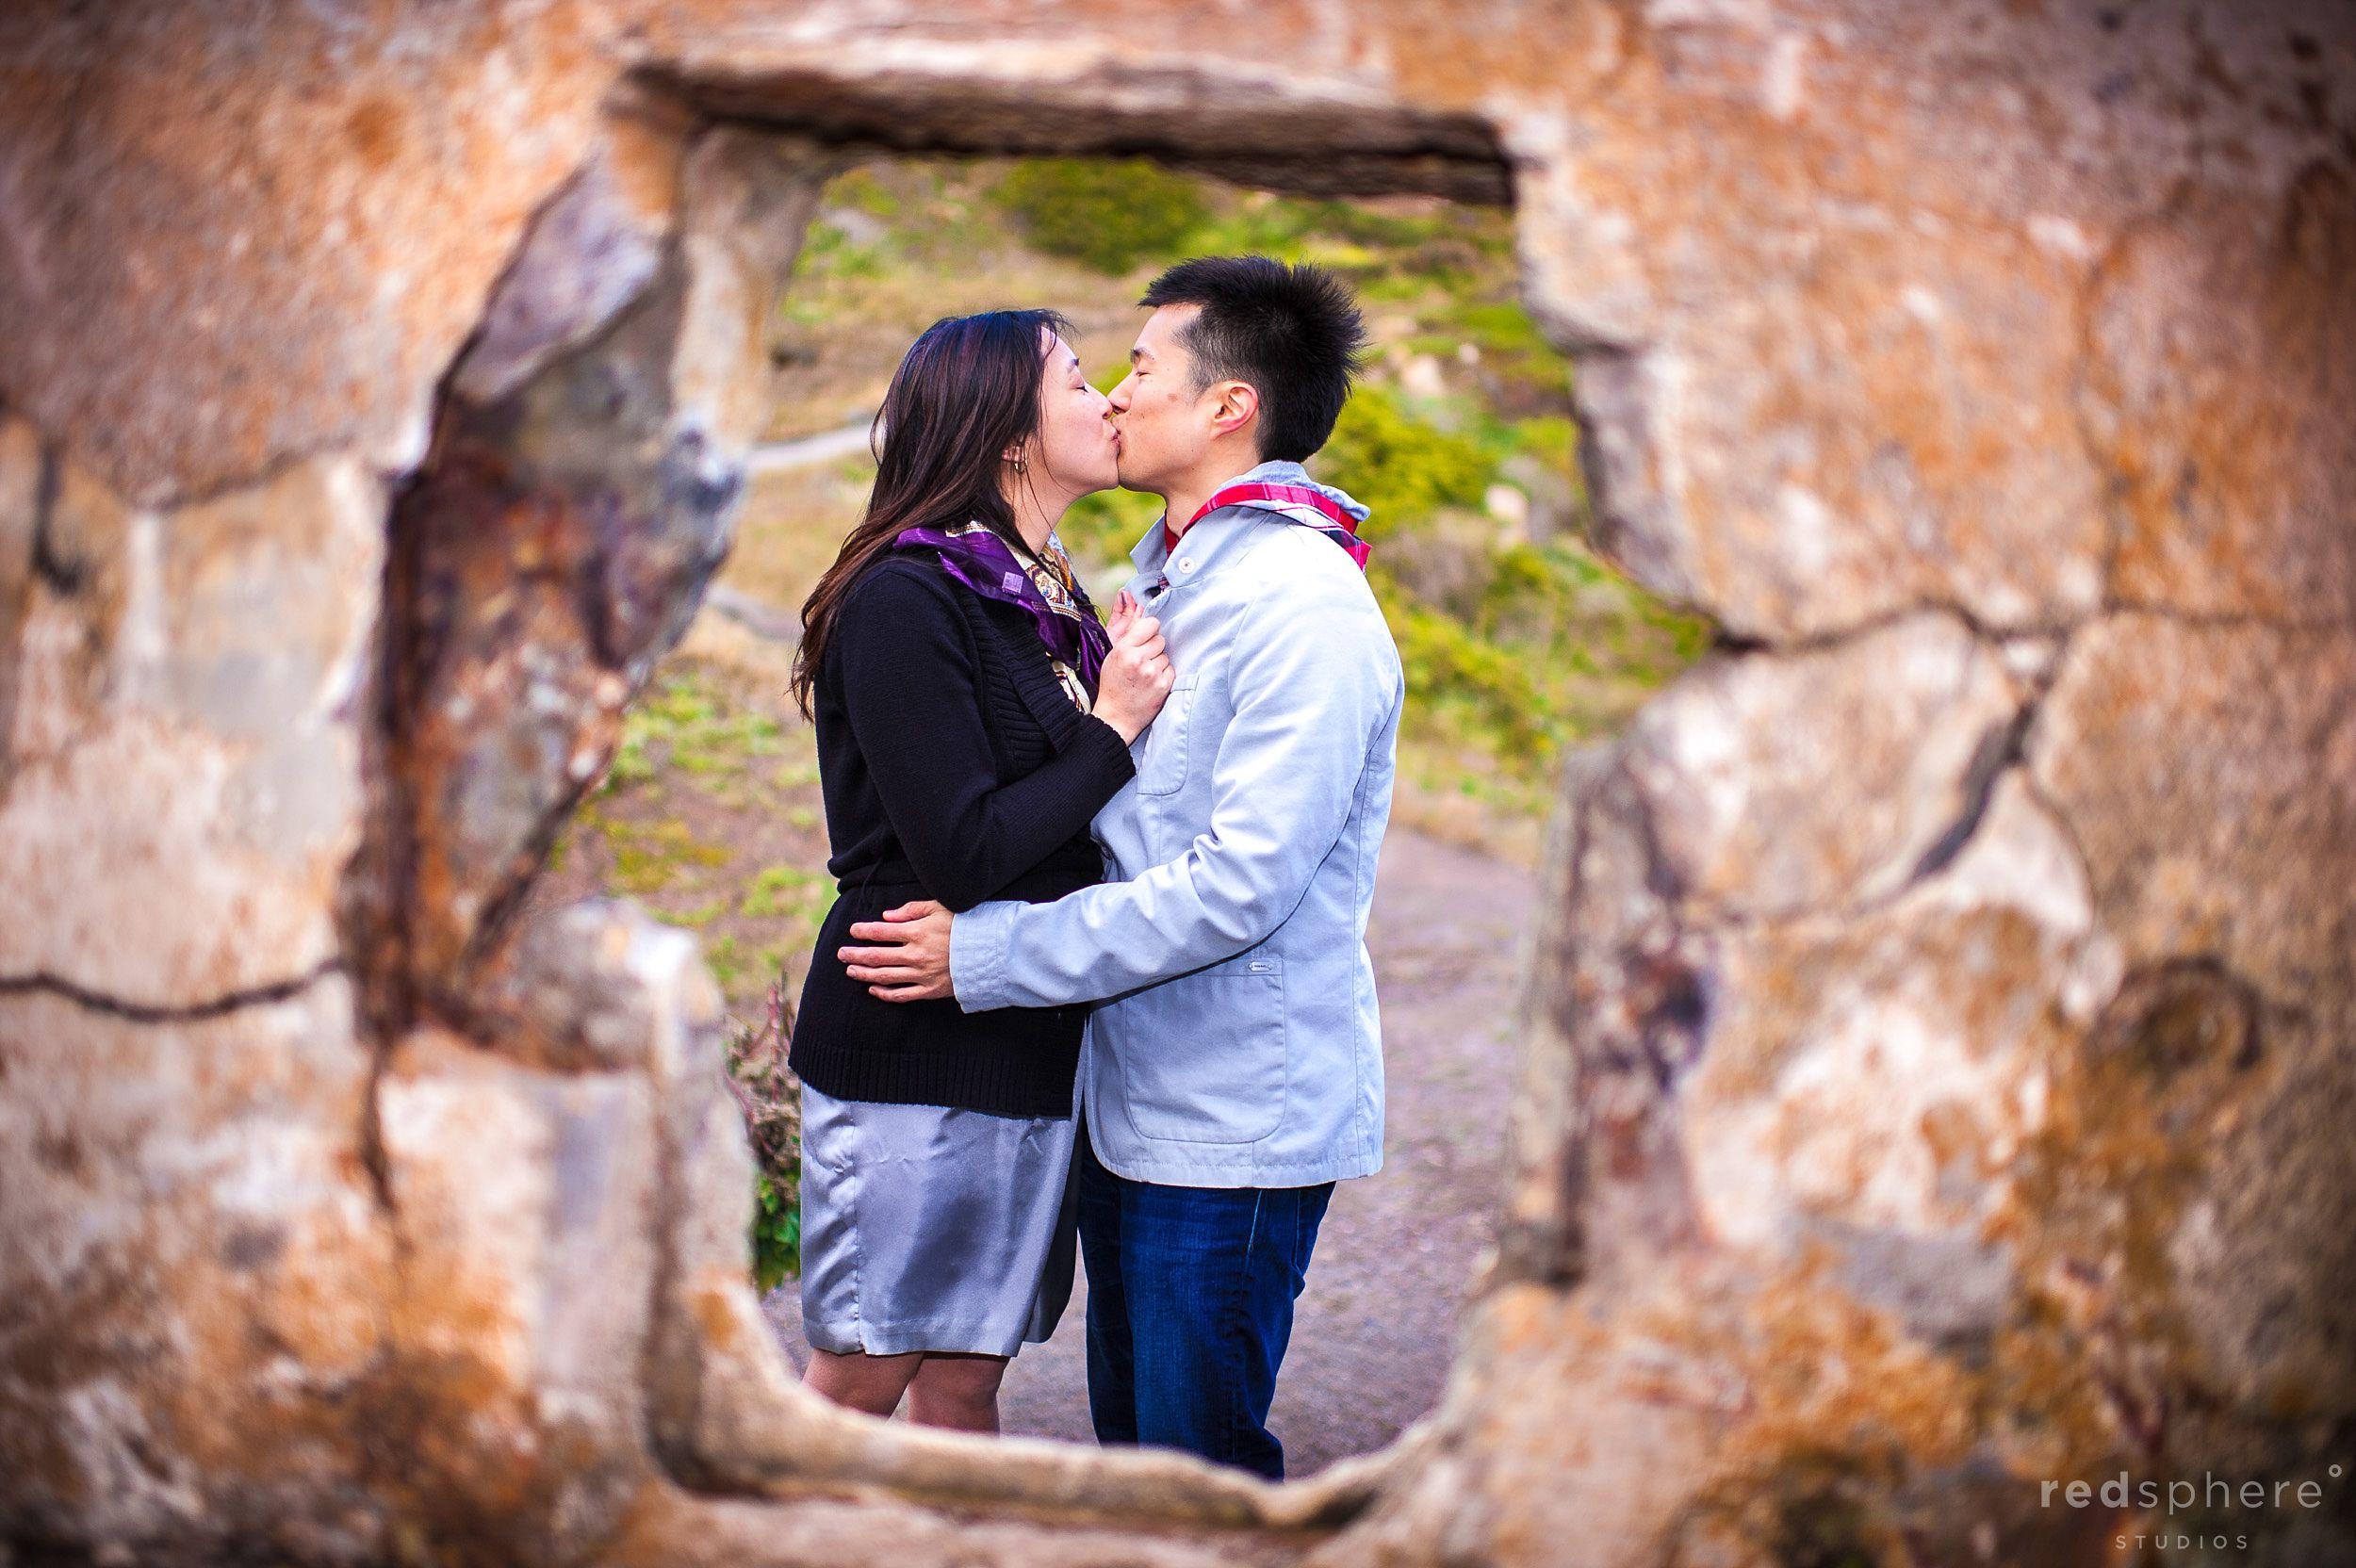 Couple Kiss Between Holes In Rocks, Sutro Bath Ruins